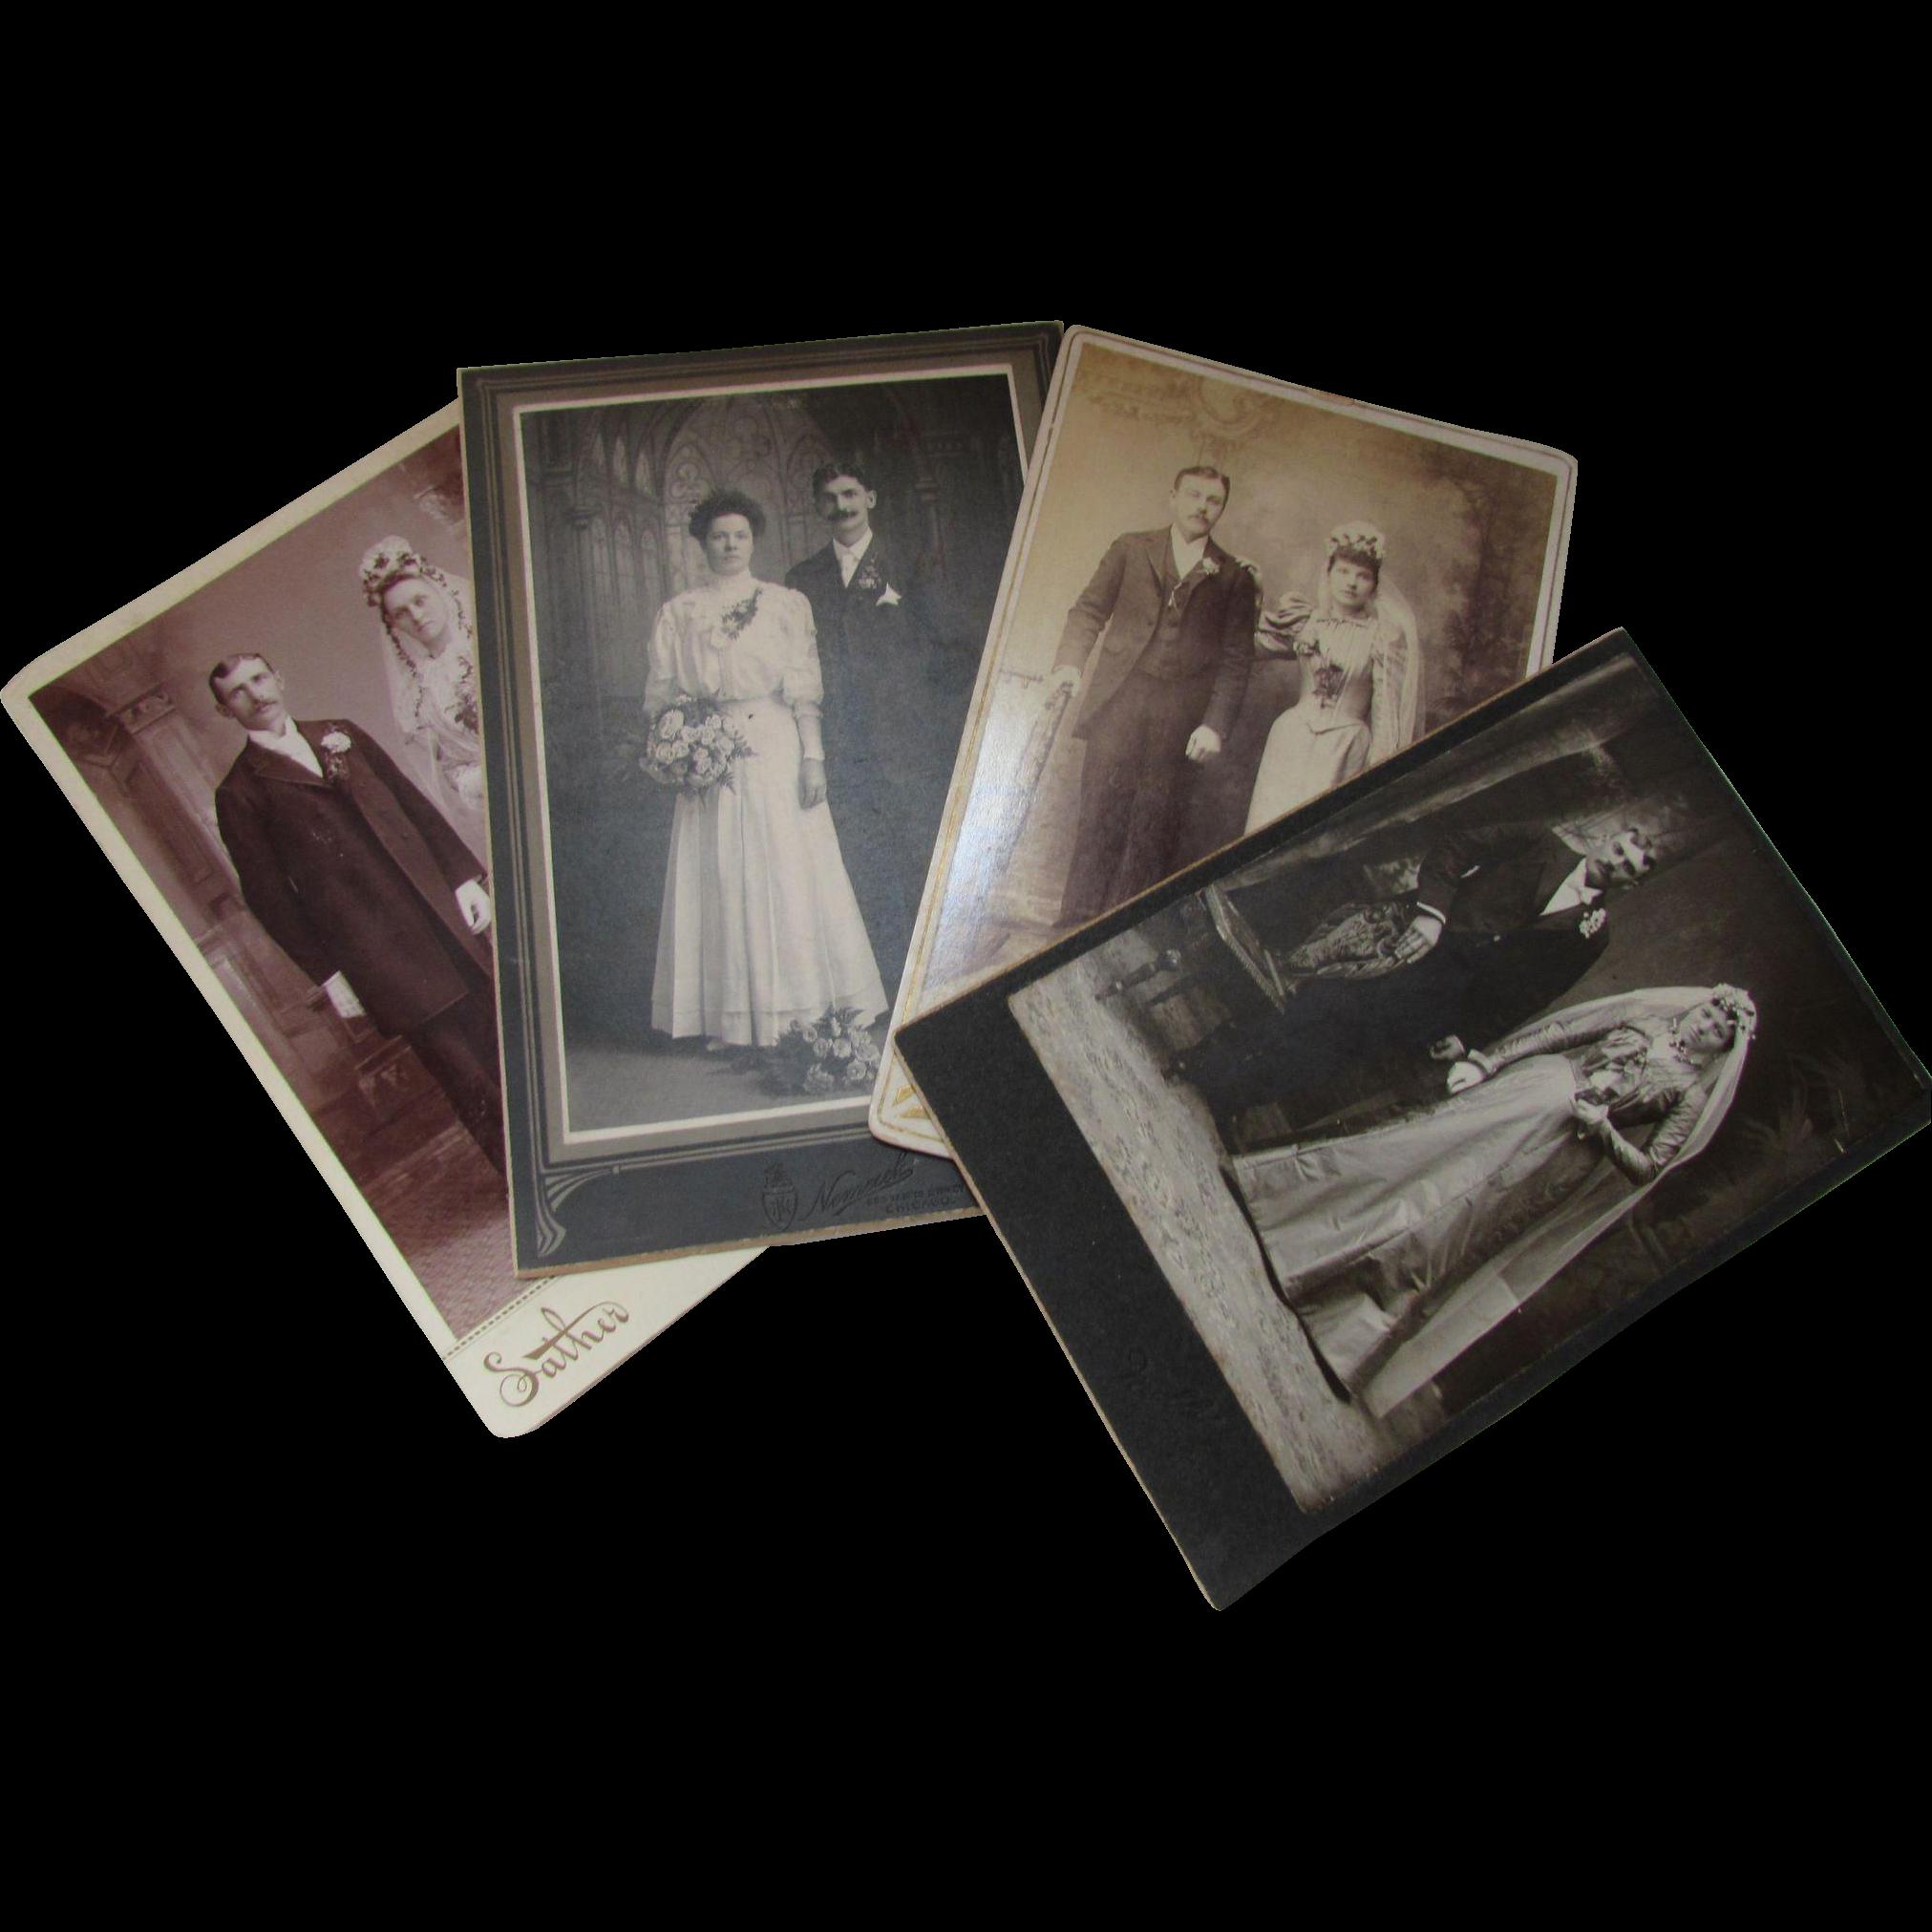 Four Victorian Era Photographs Wedding Couples in Full Regalia